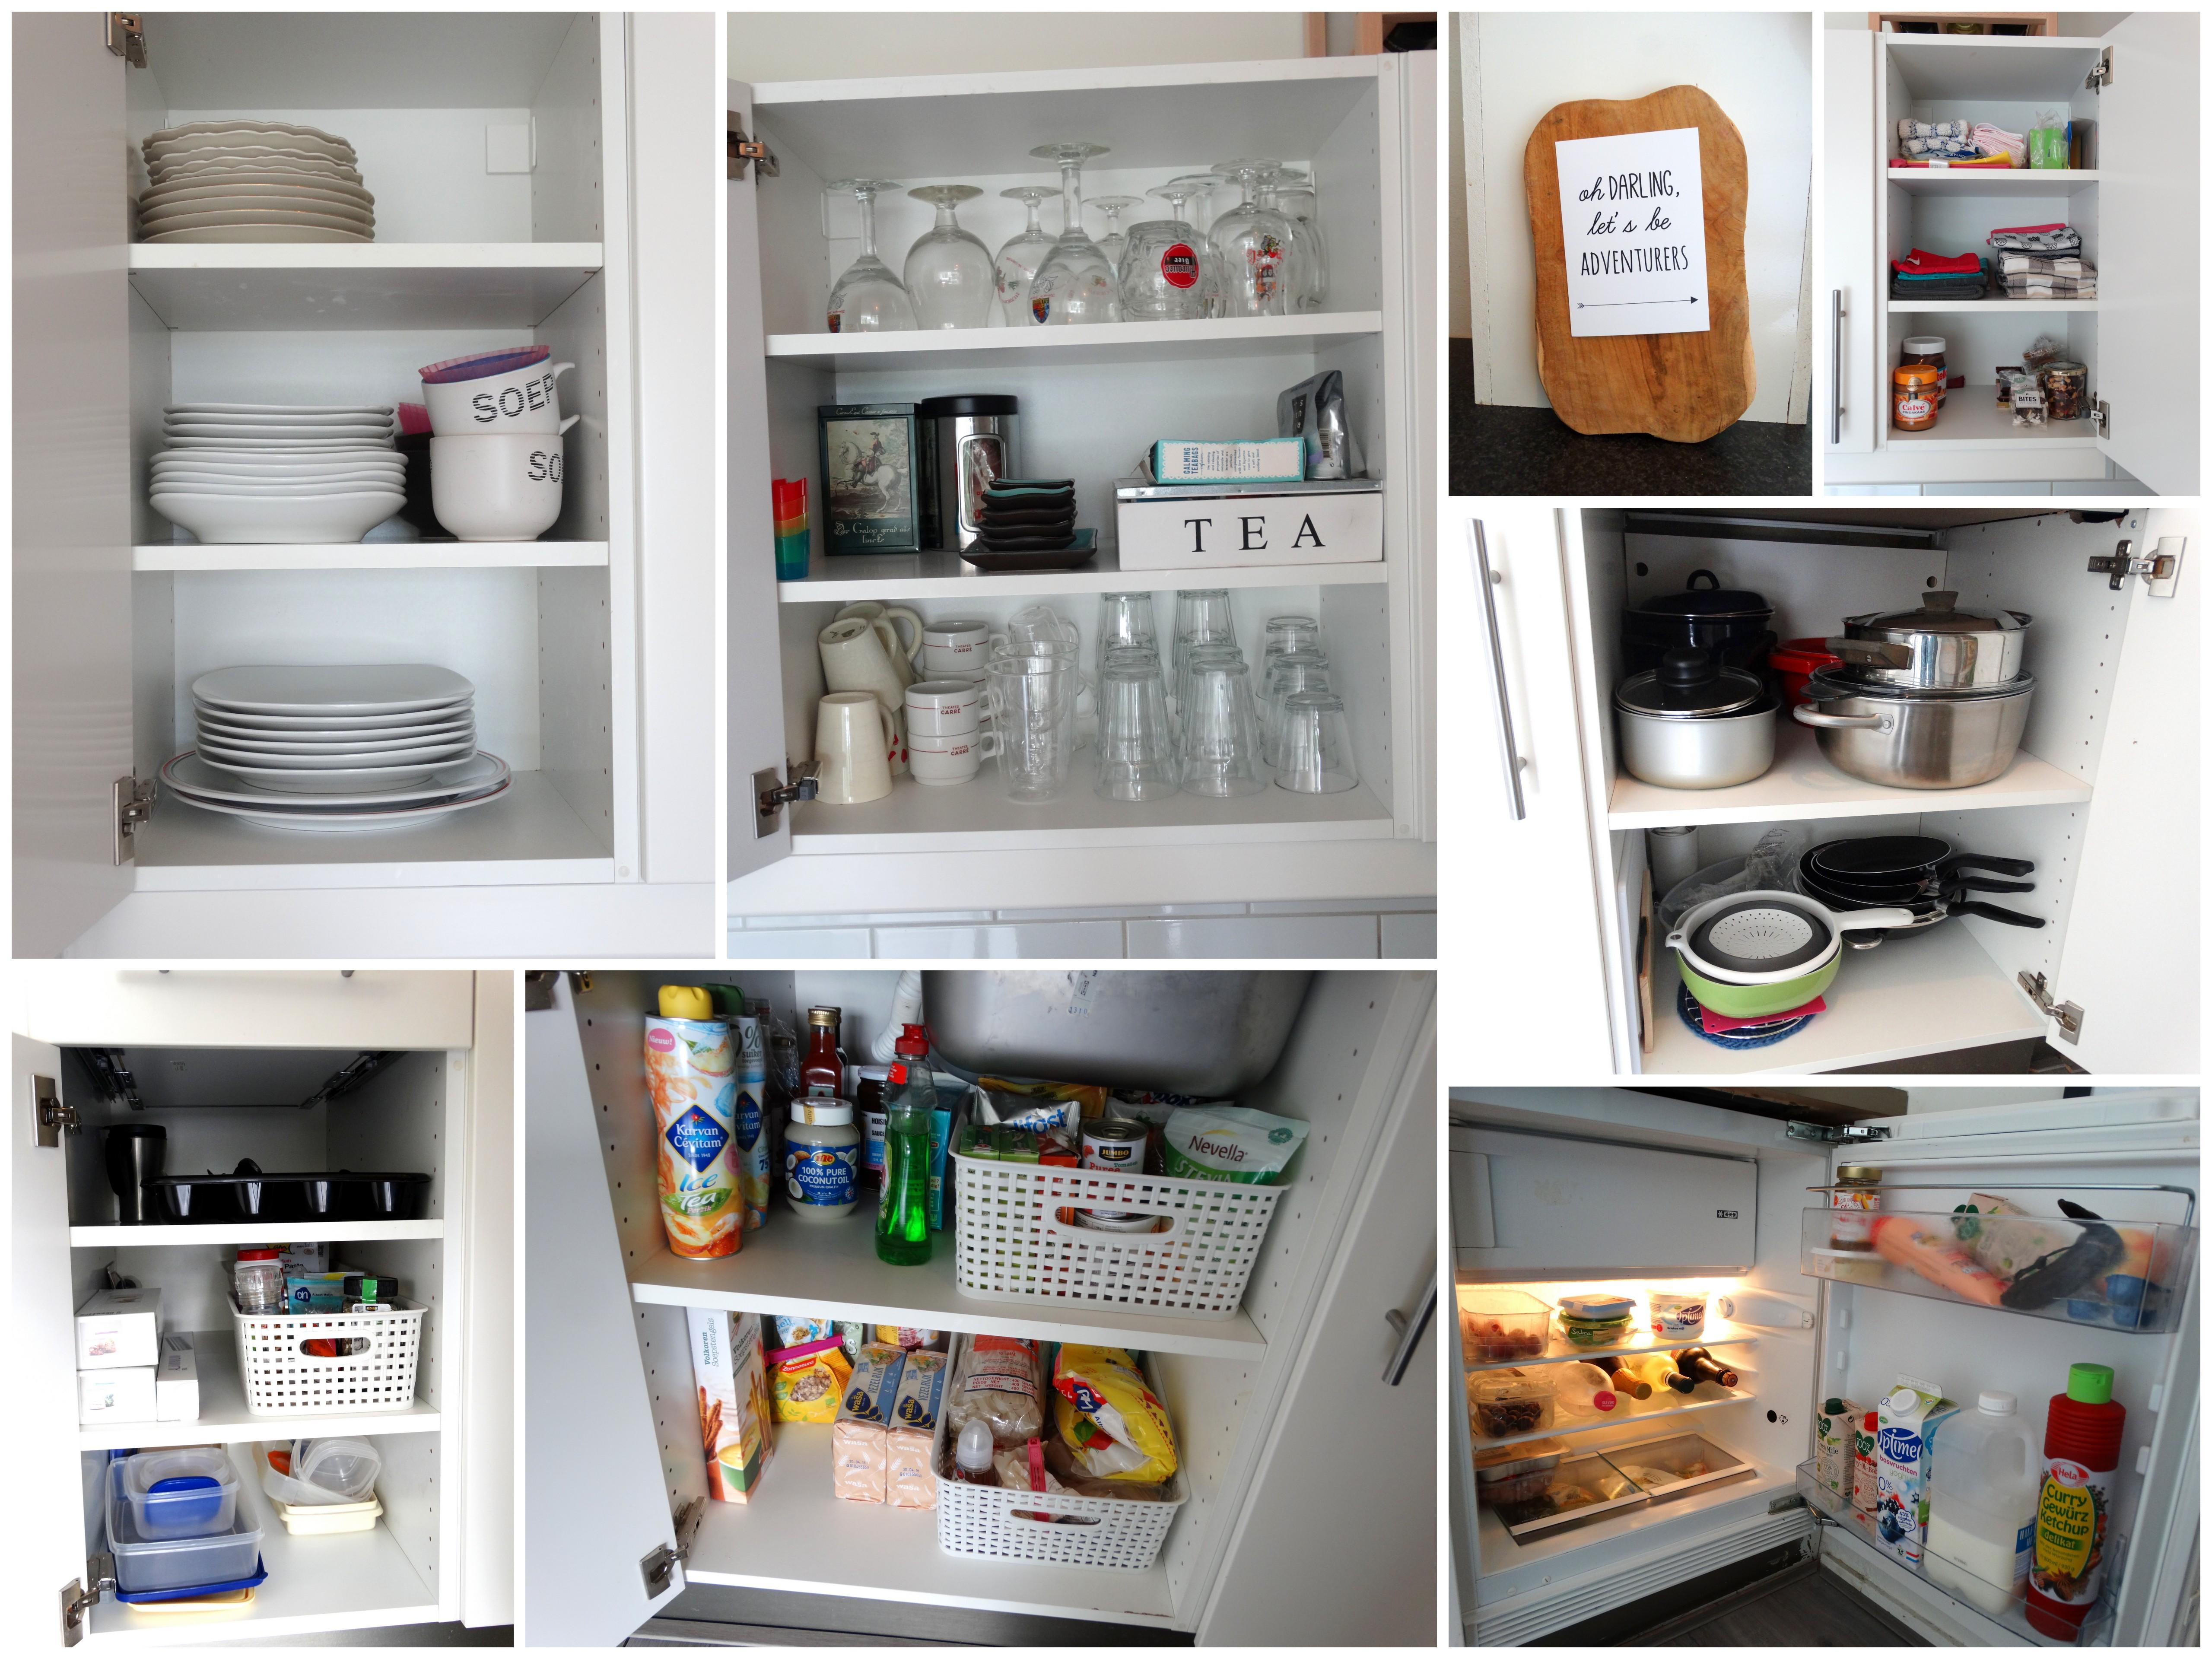 Keuken Indeling Kasten : nieuwe keuken indeling kasten